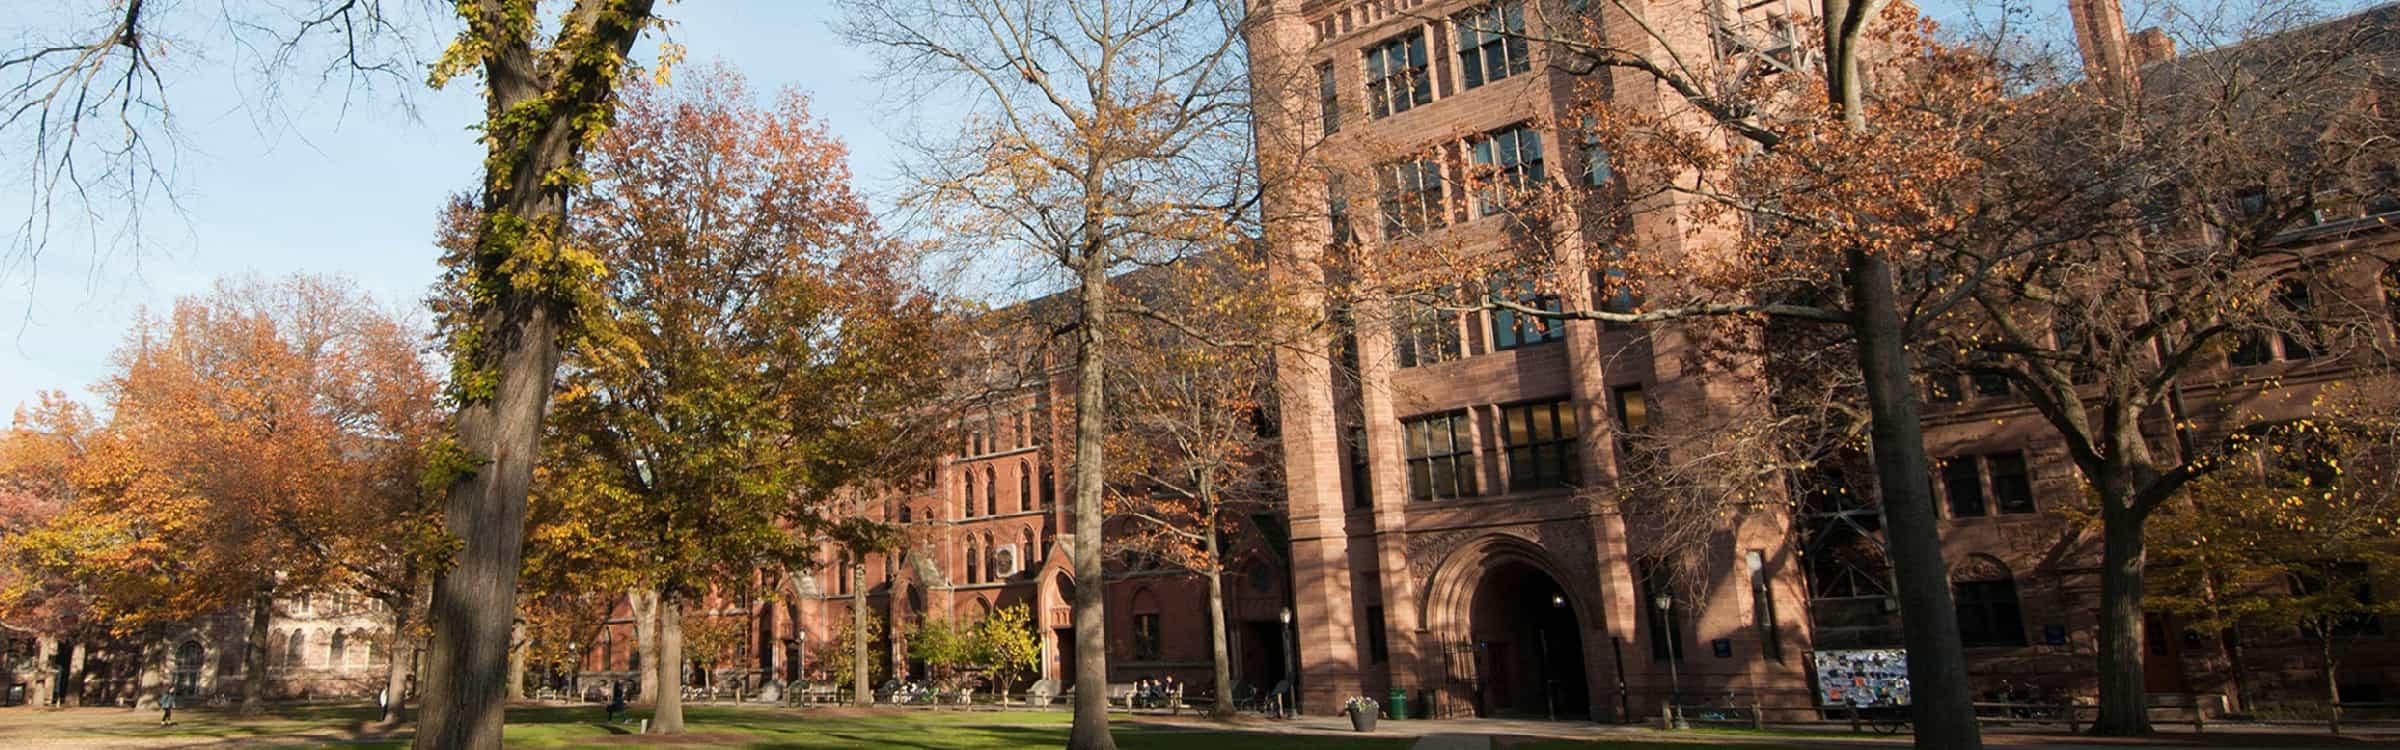 Yale-University-Banner-2400-x-750